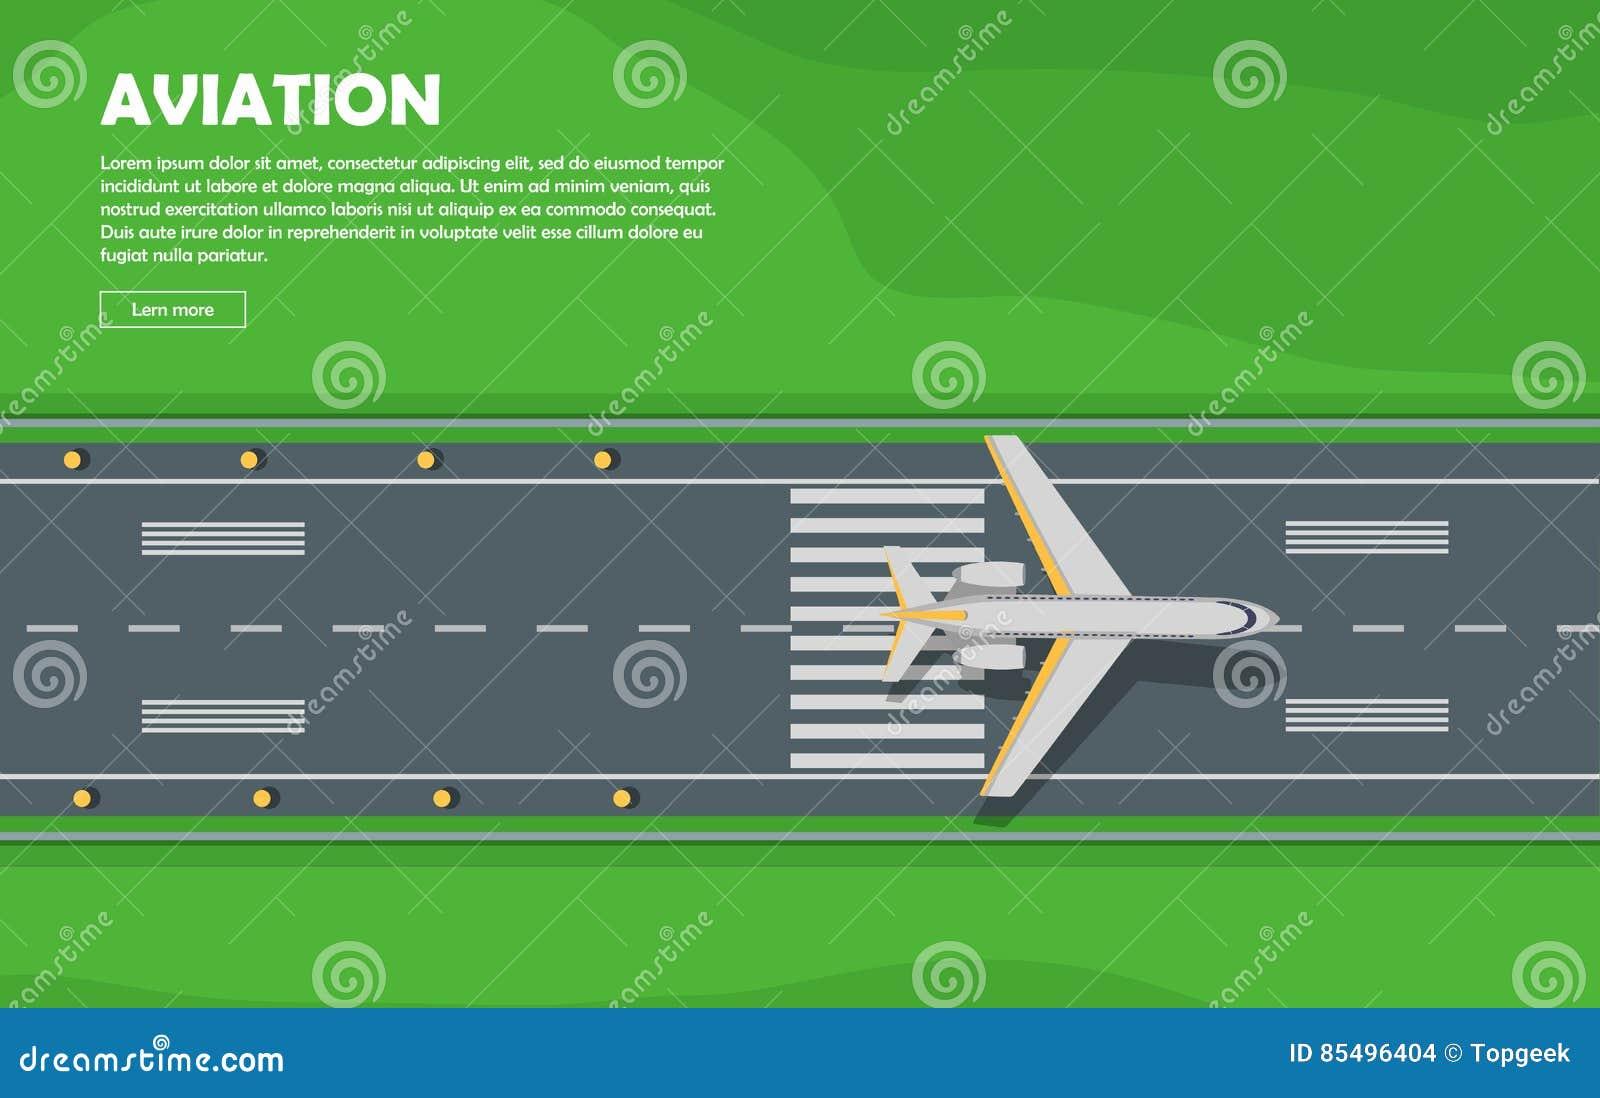 Luchtvaart Vliegtuigen baan vlucht Vector banner